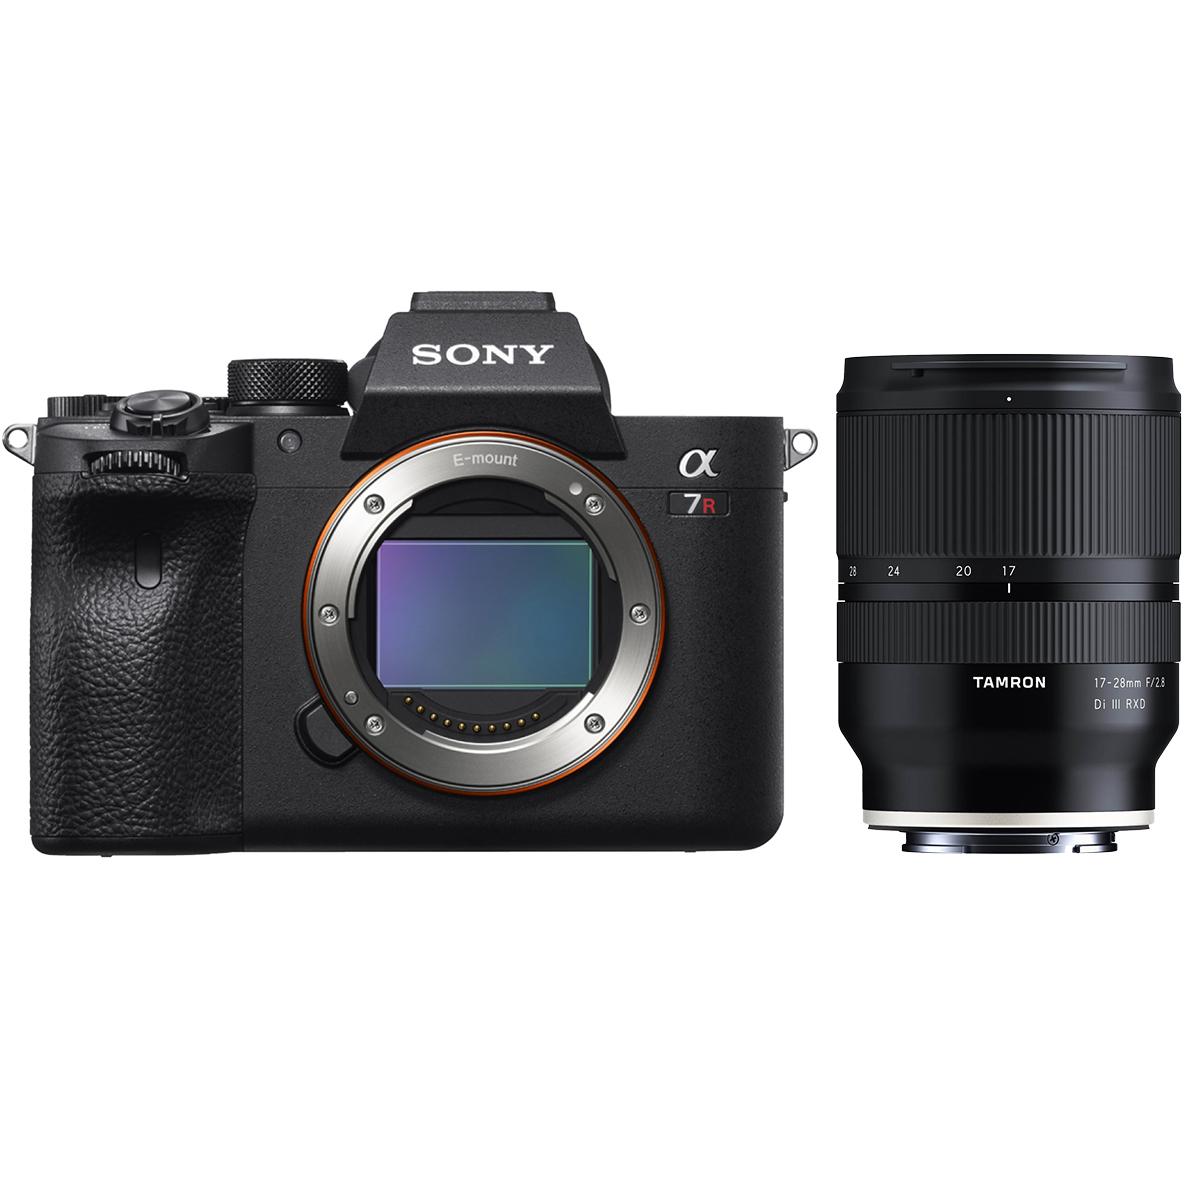 Sony Alpha 7R III A + Tamron 17-28 mm 1:2,8 Di III RXD